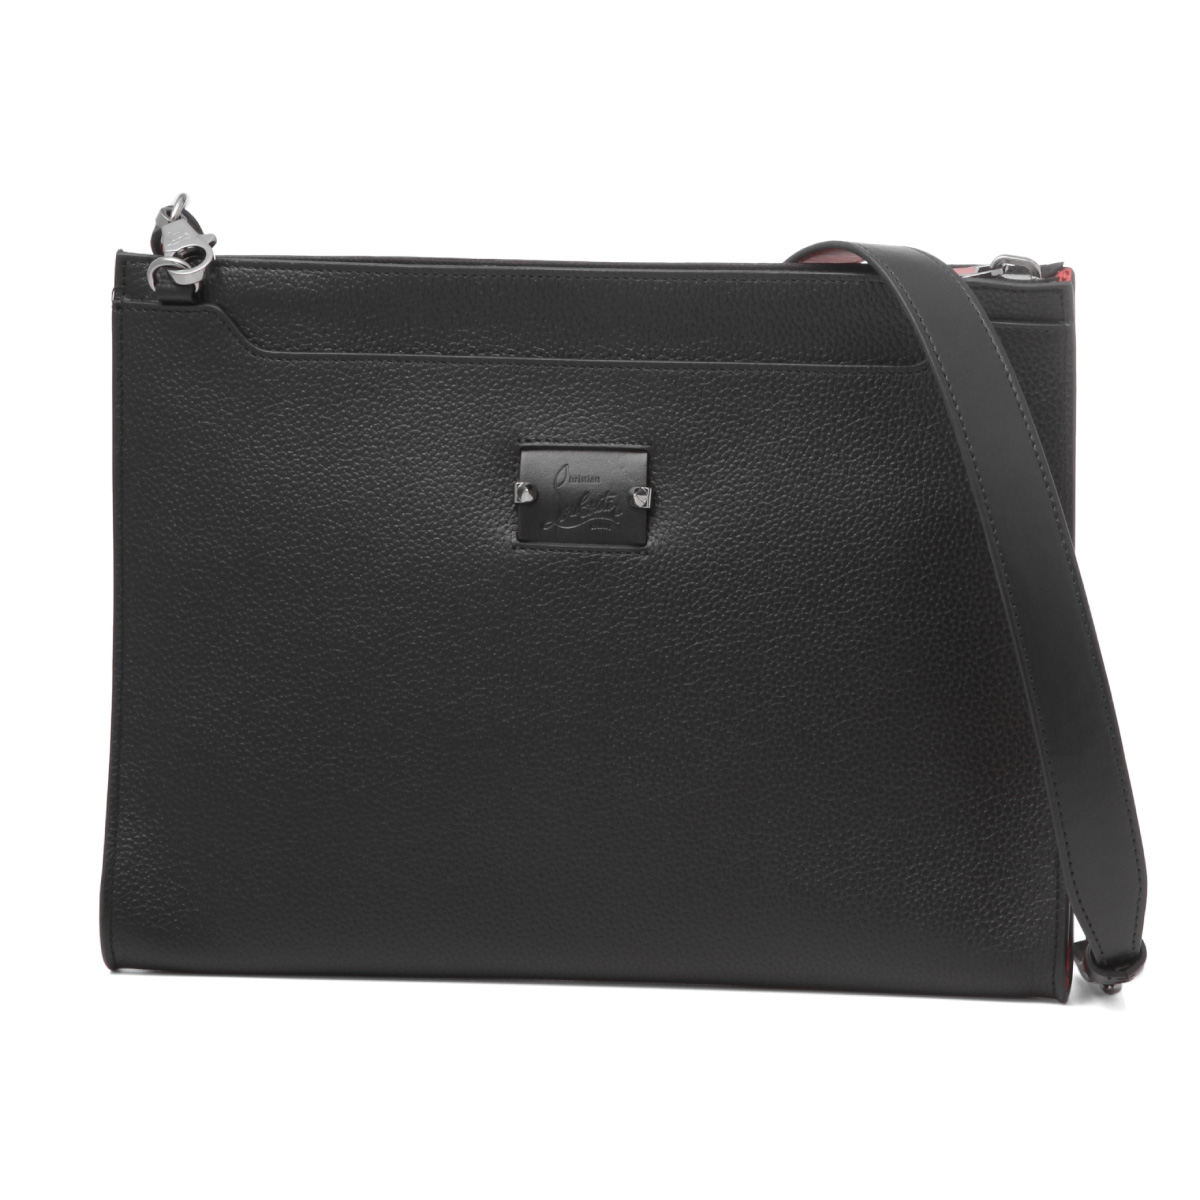 f9061d627d 3185087 クリスチャンルブタン Christian Louboutin bag men B078 shoulders clutch bag  SKYPOUCH LOUBICITY sky porch agate ...